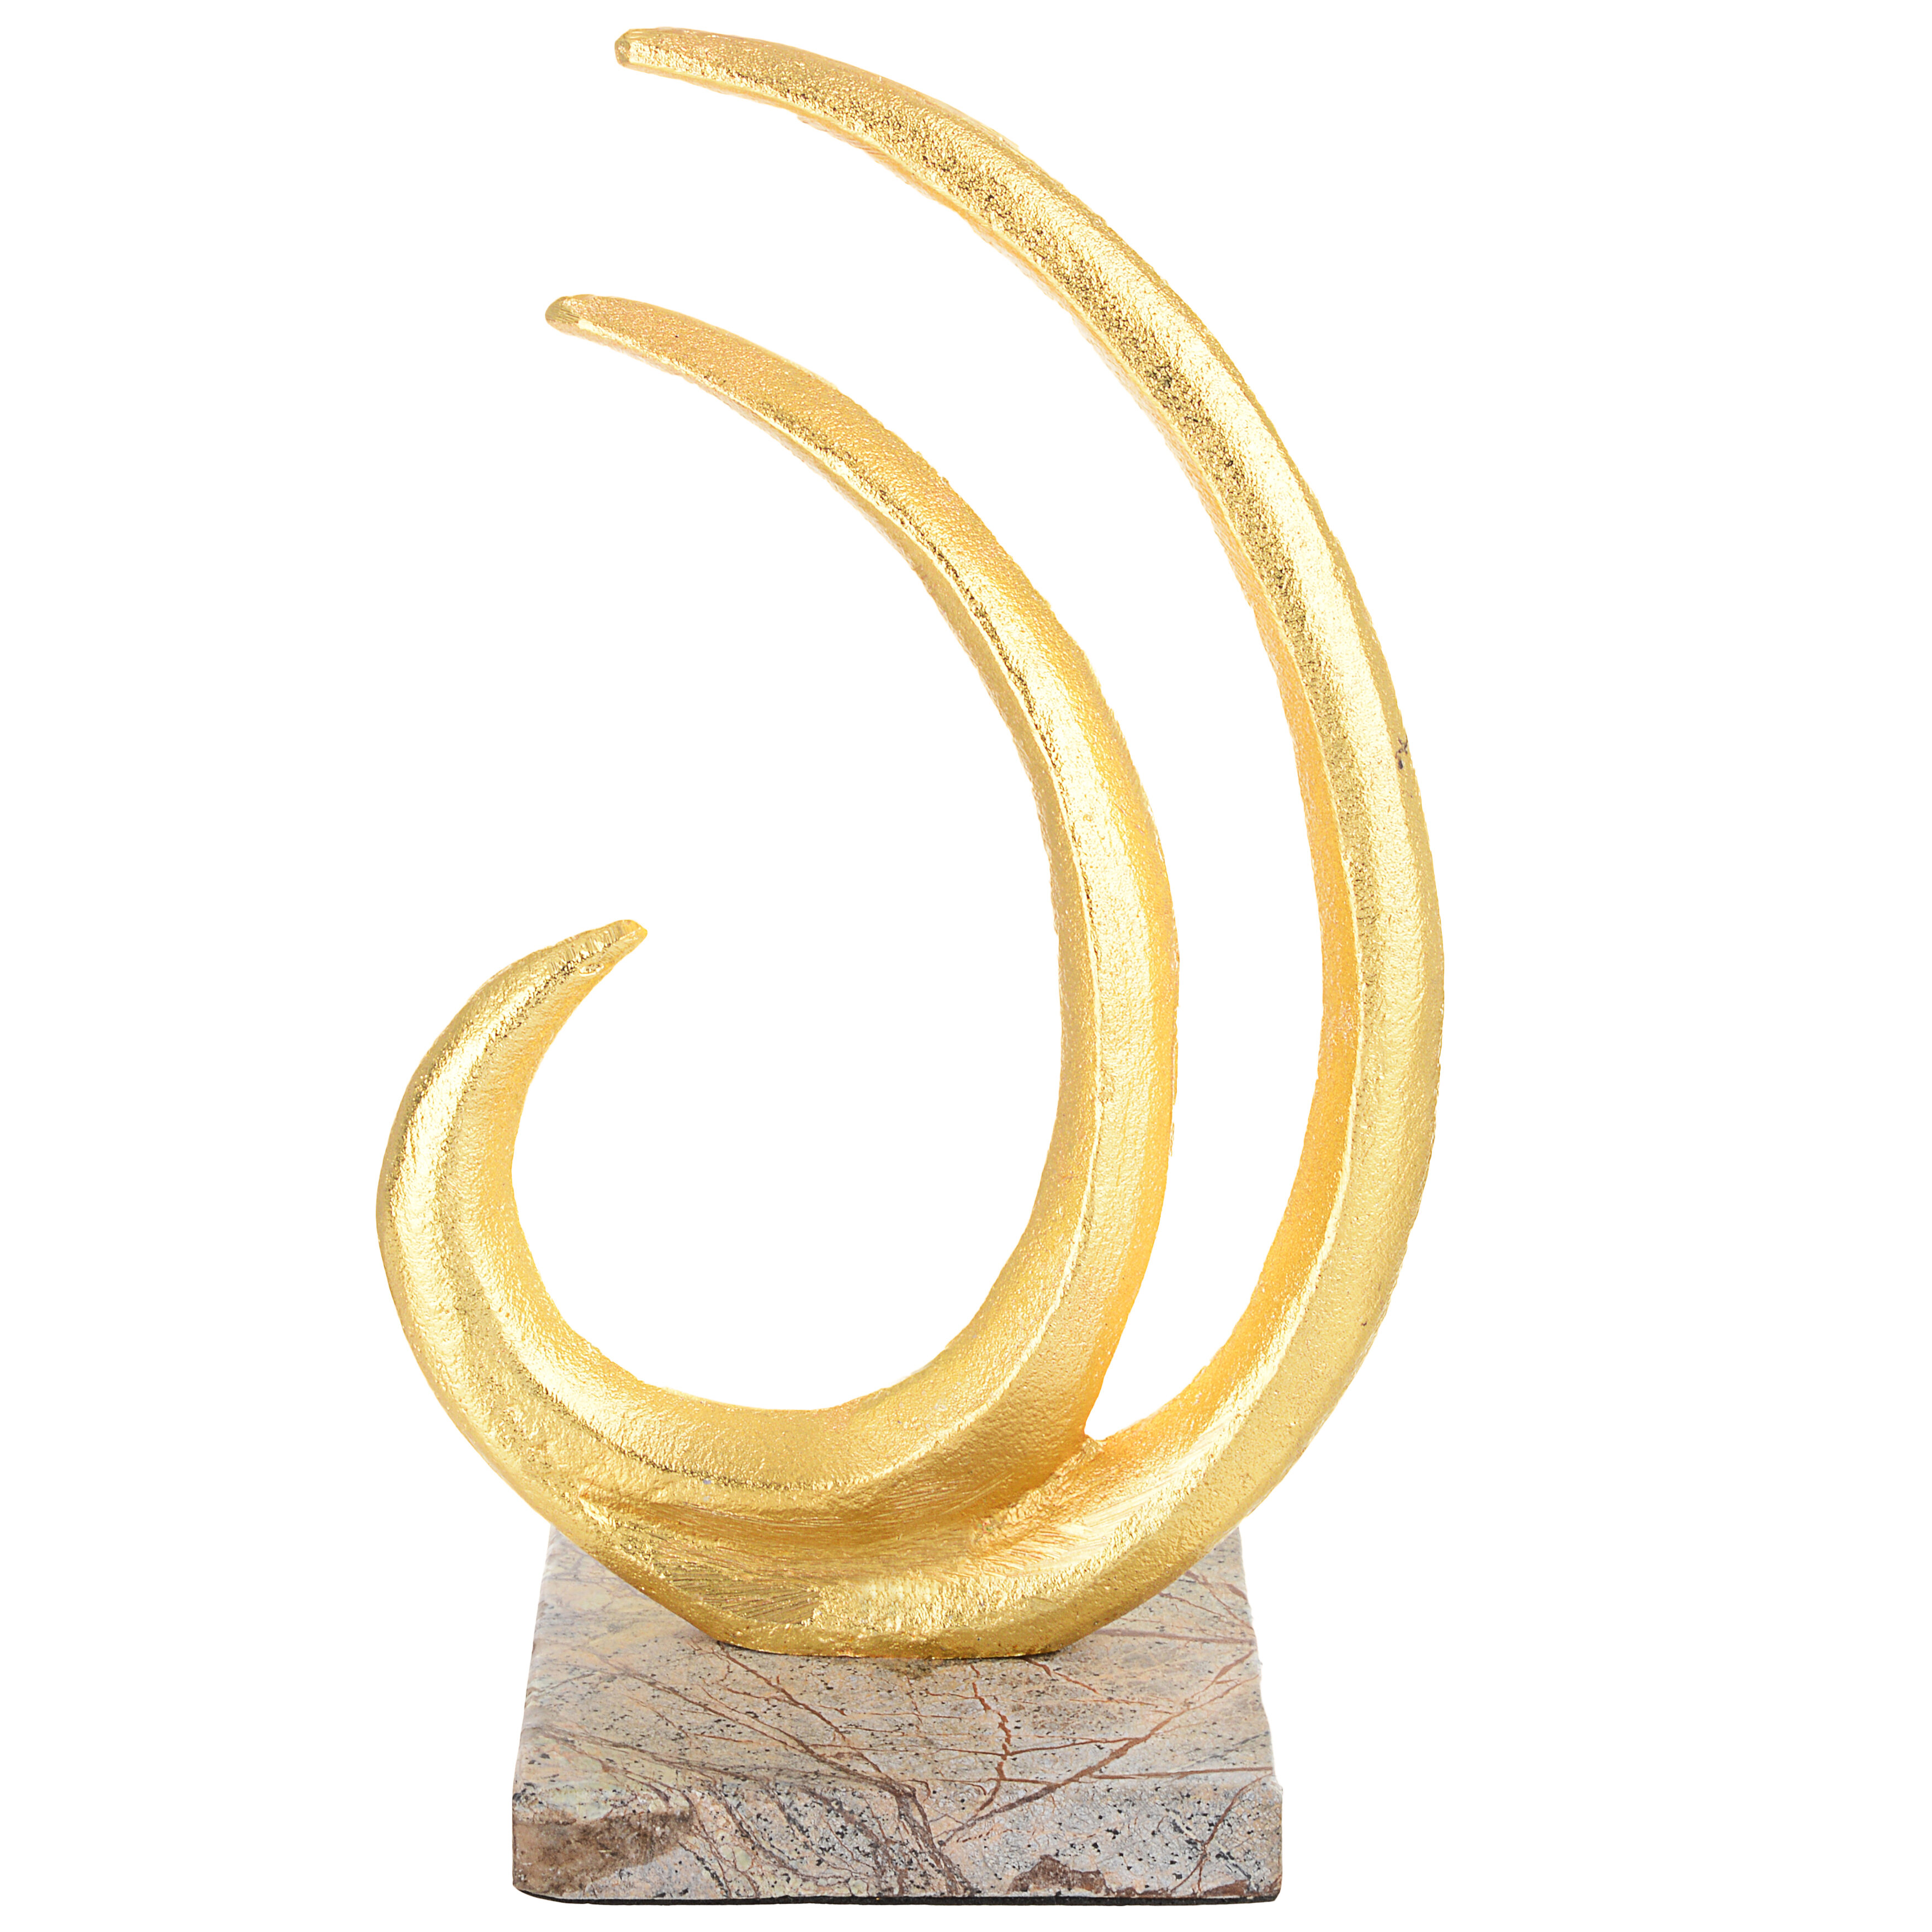 AAA Bath Alm Casted Sculpture   Wayfair